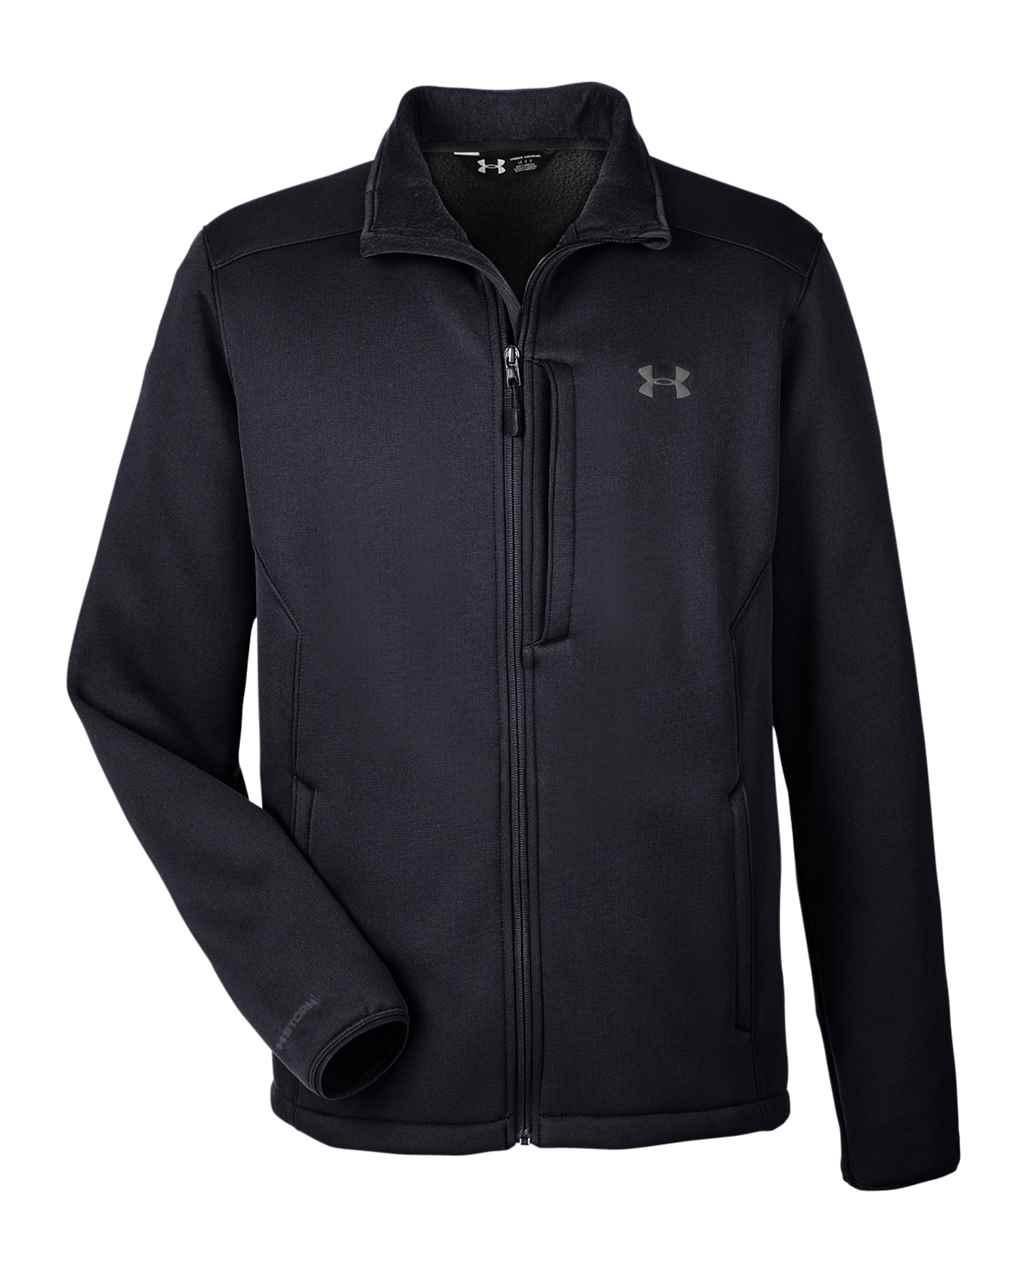 Picture of Under Armour Men's UA Extreme Coldgear® Jacket